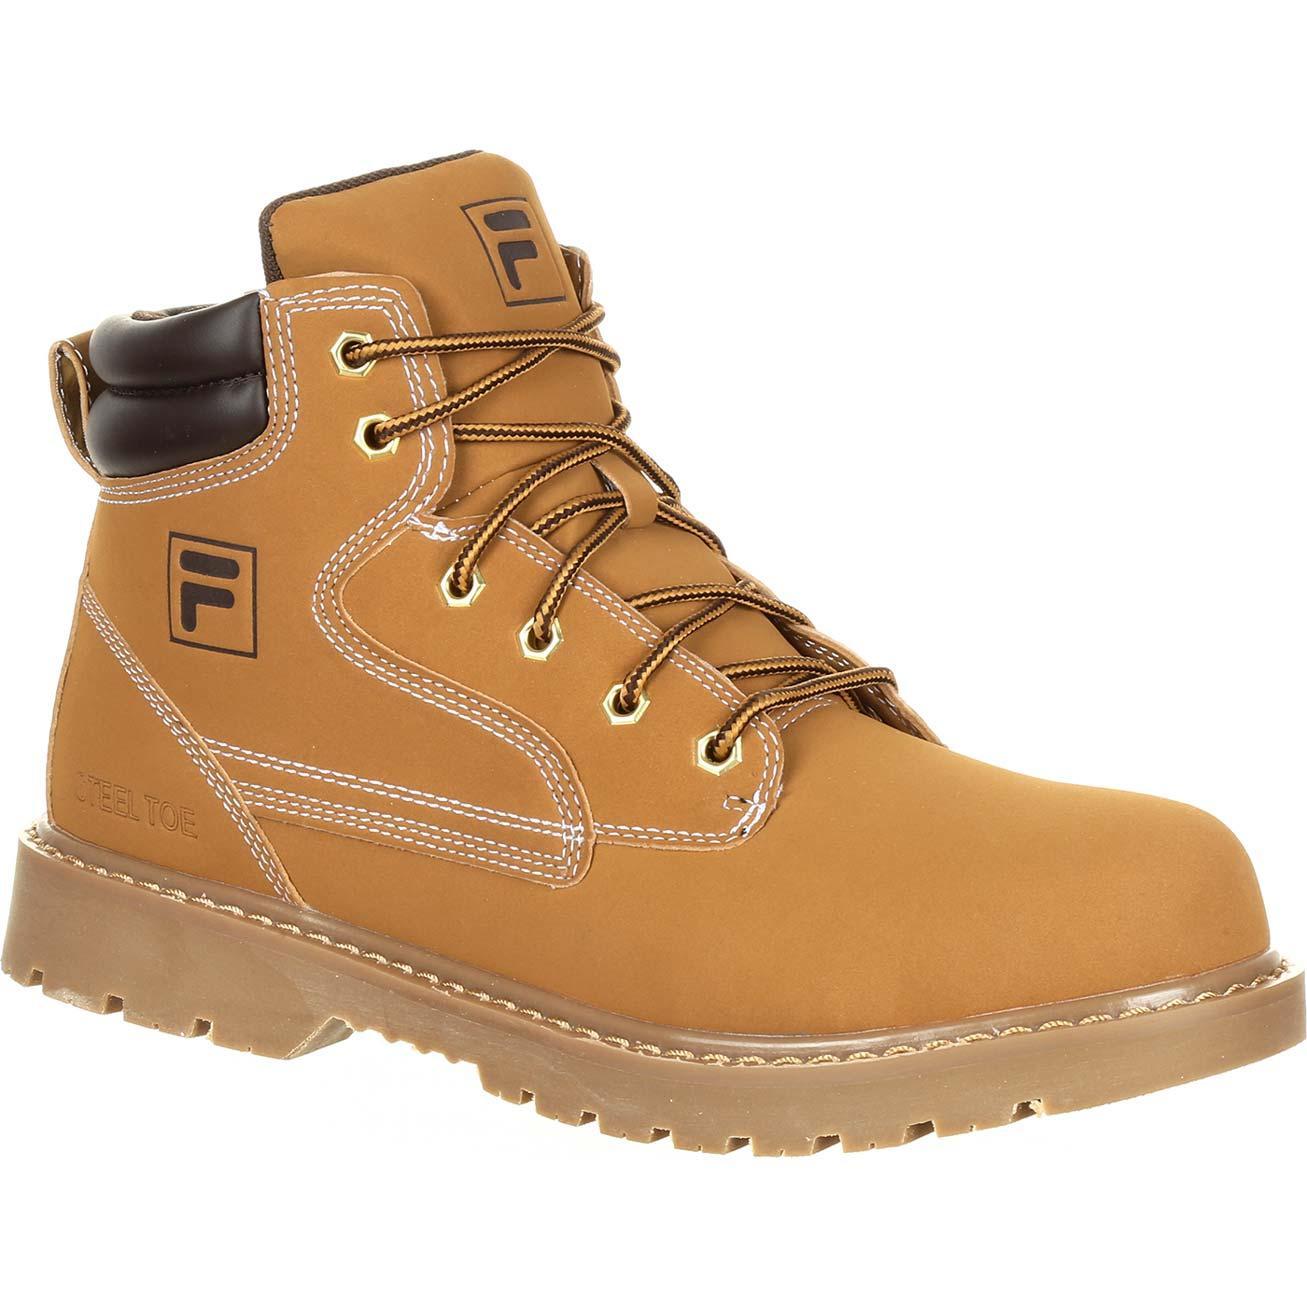 fila steel toe shoes Sale,up to 31